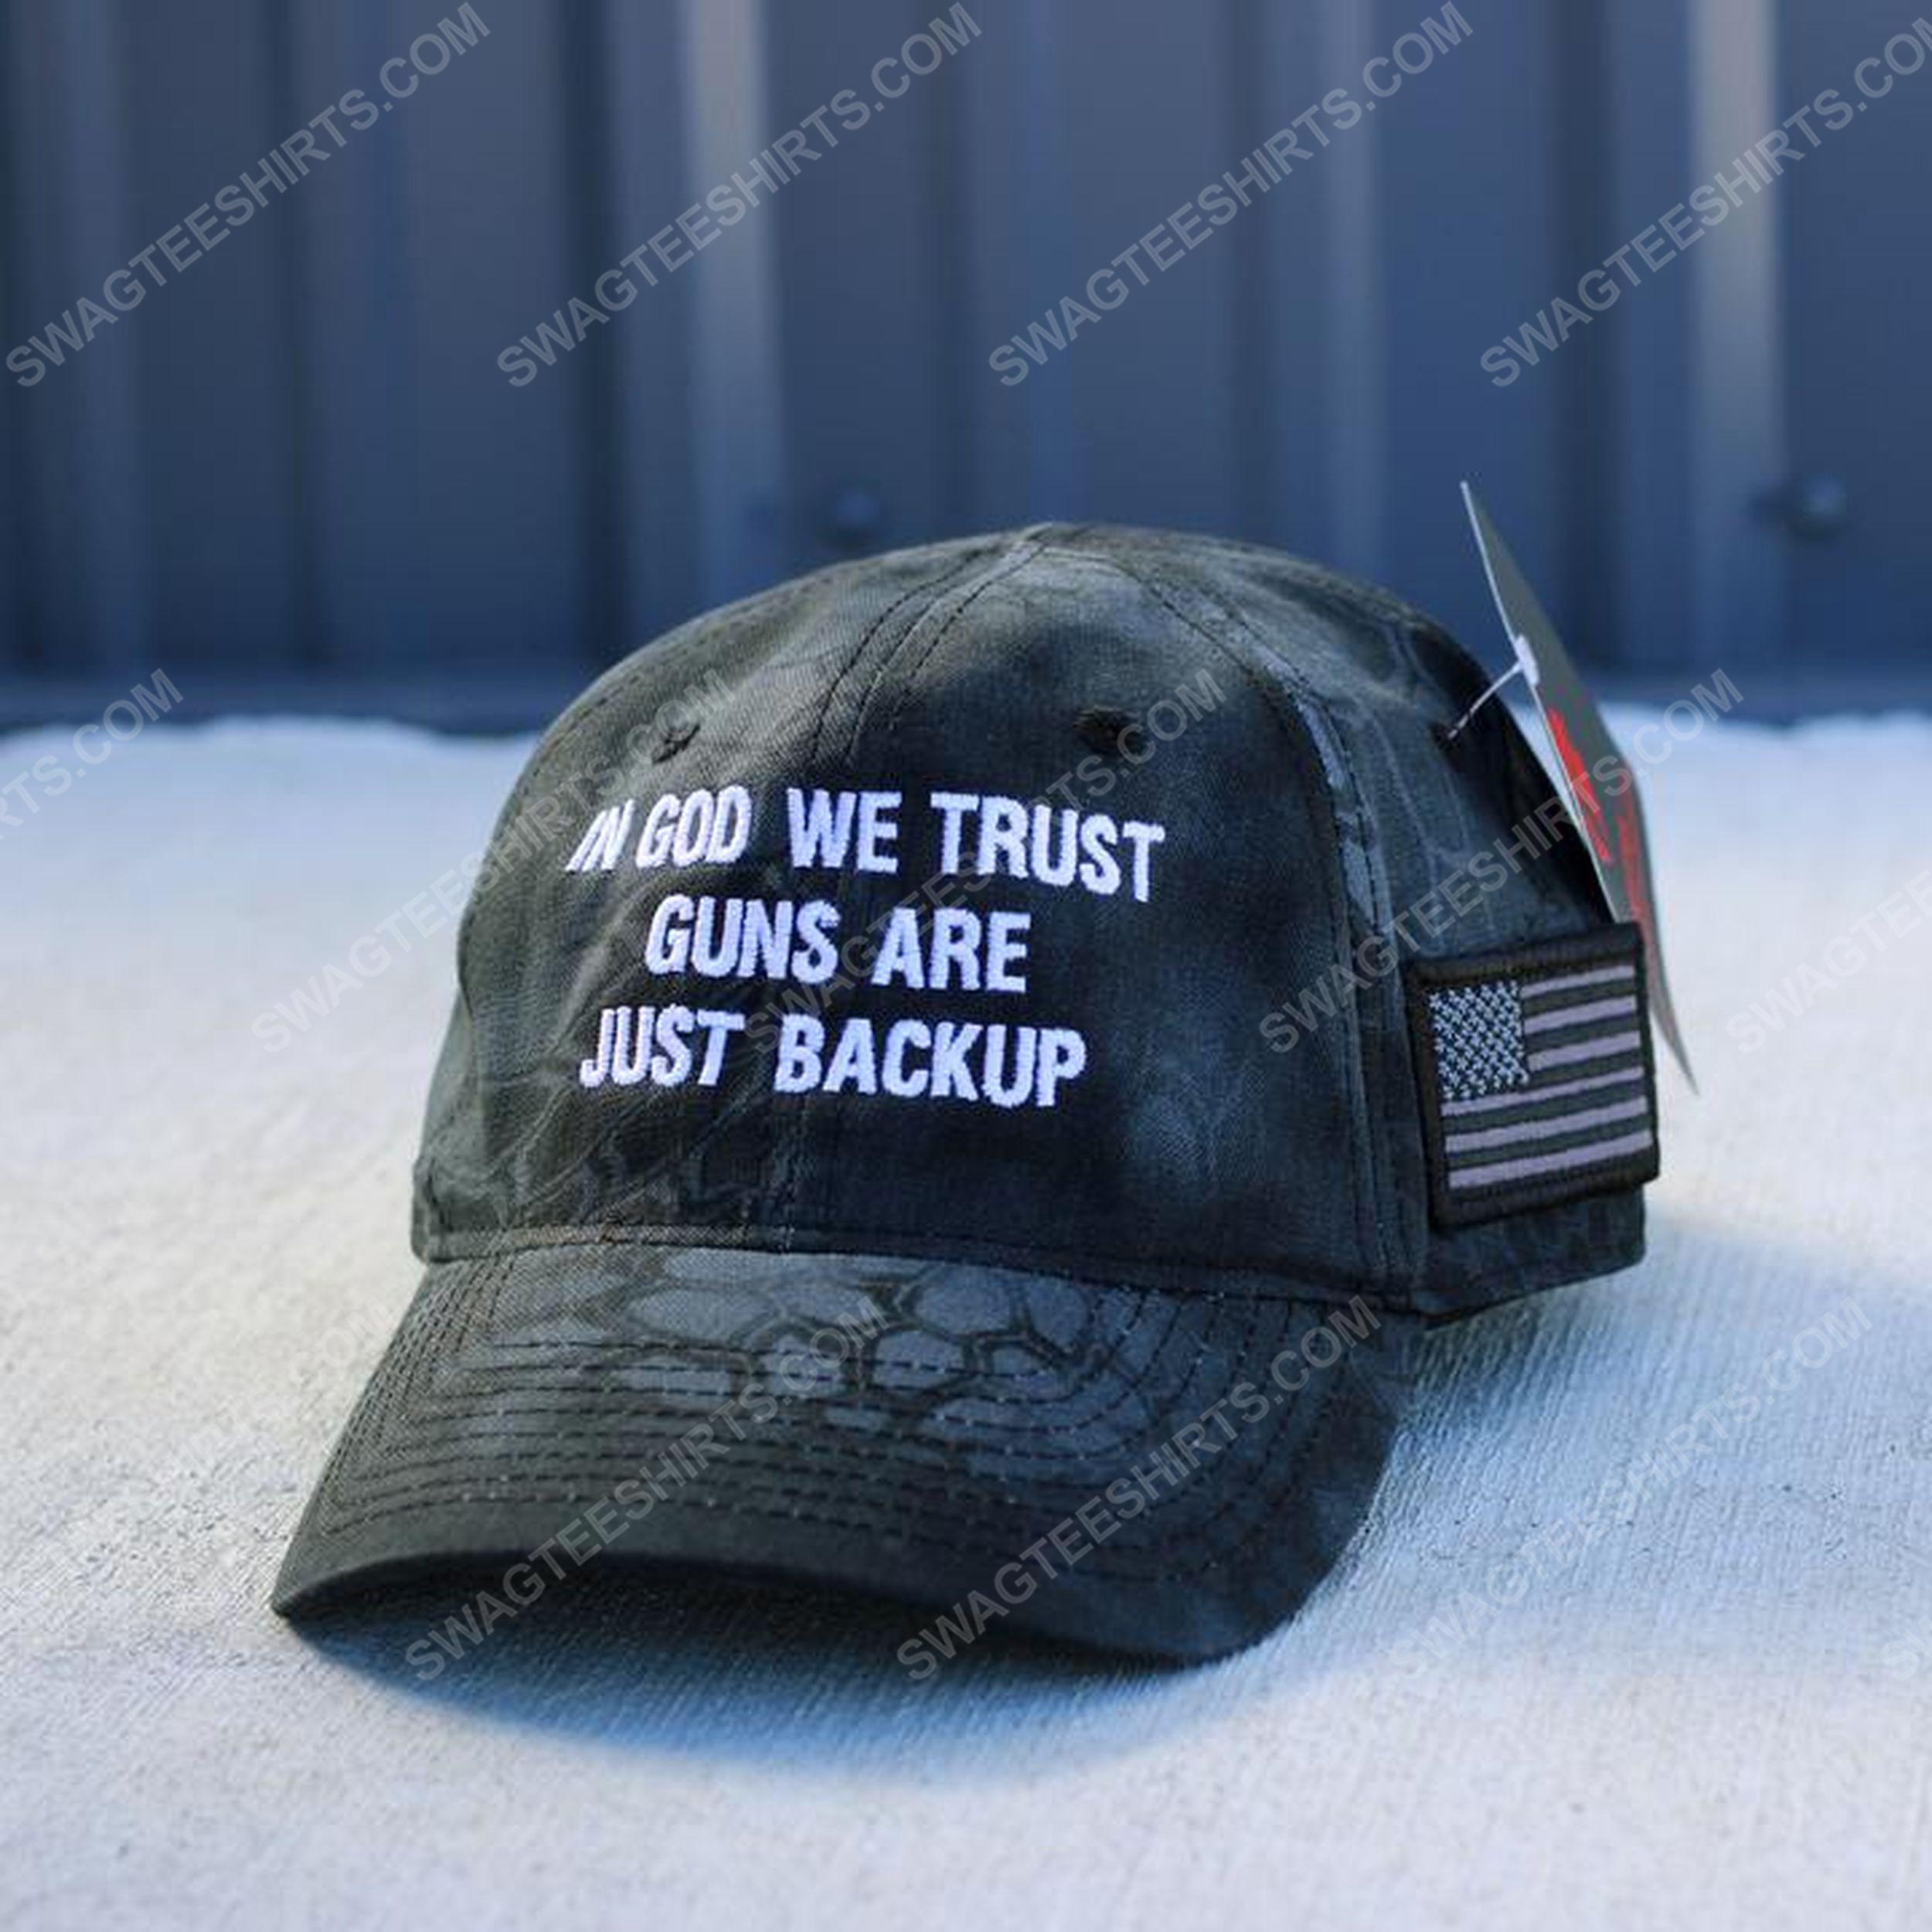 In God we trust guns are just backup full print classic hat 1